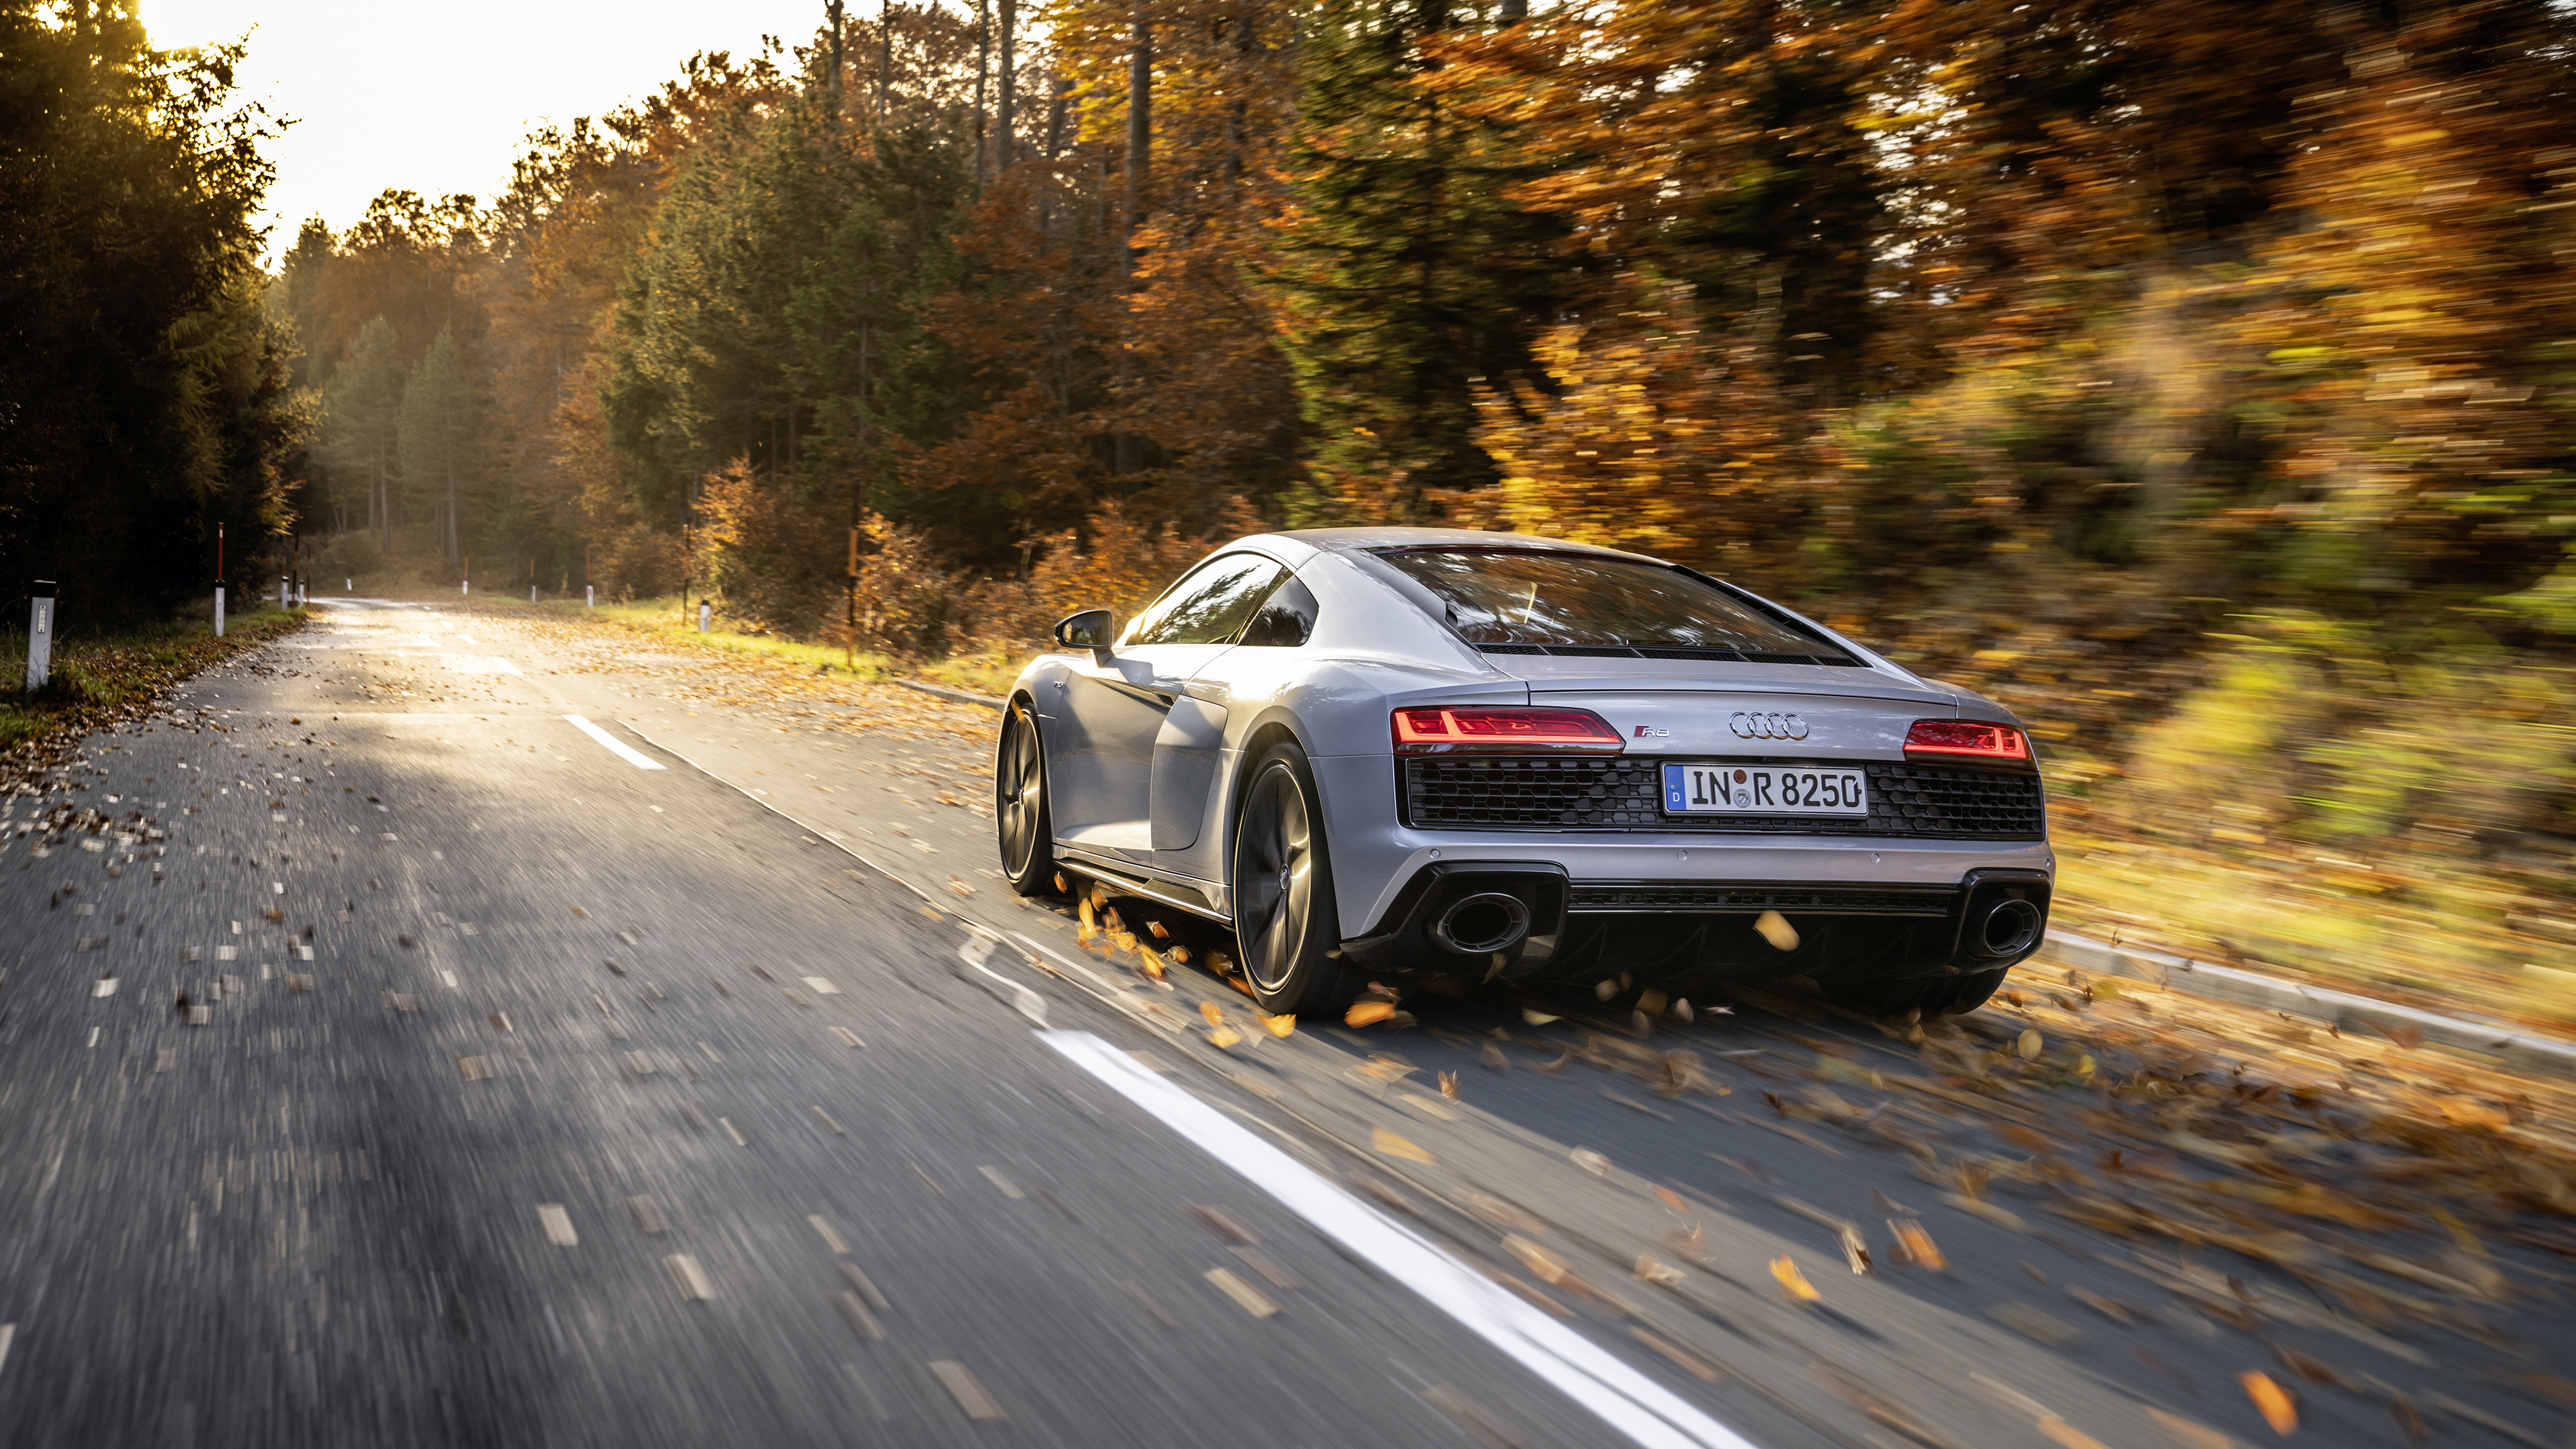 Audi R8 V10 Rwd Coupe 2019 4k 5 Wallpaper Hd Car Wallpapers Id 13616